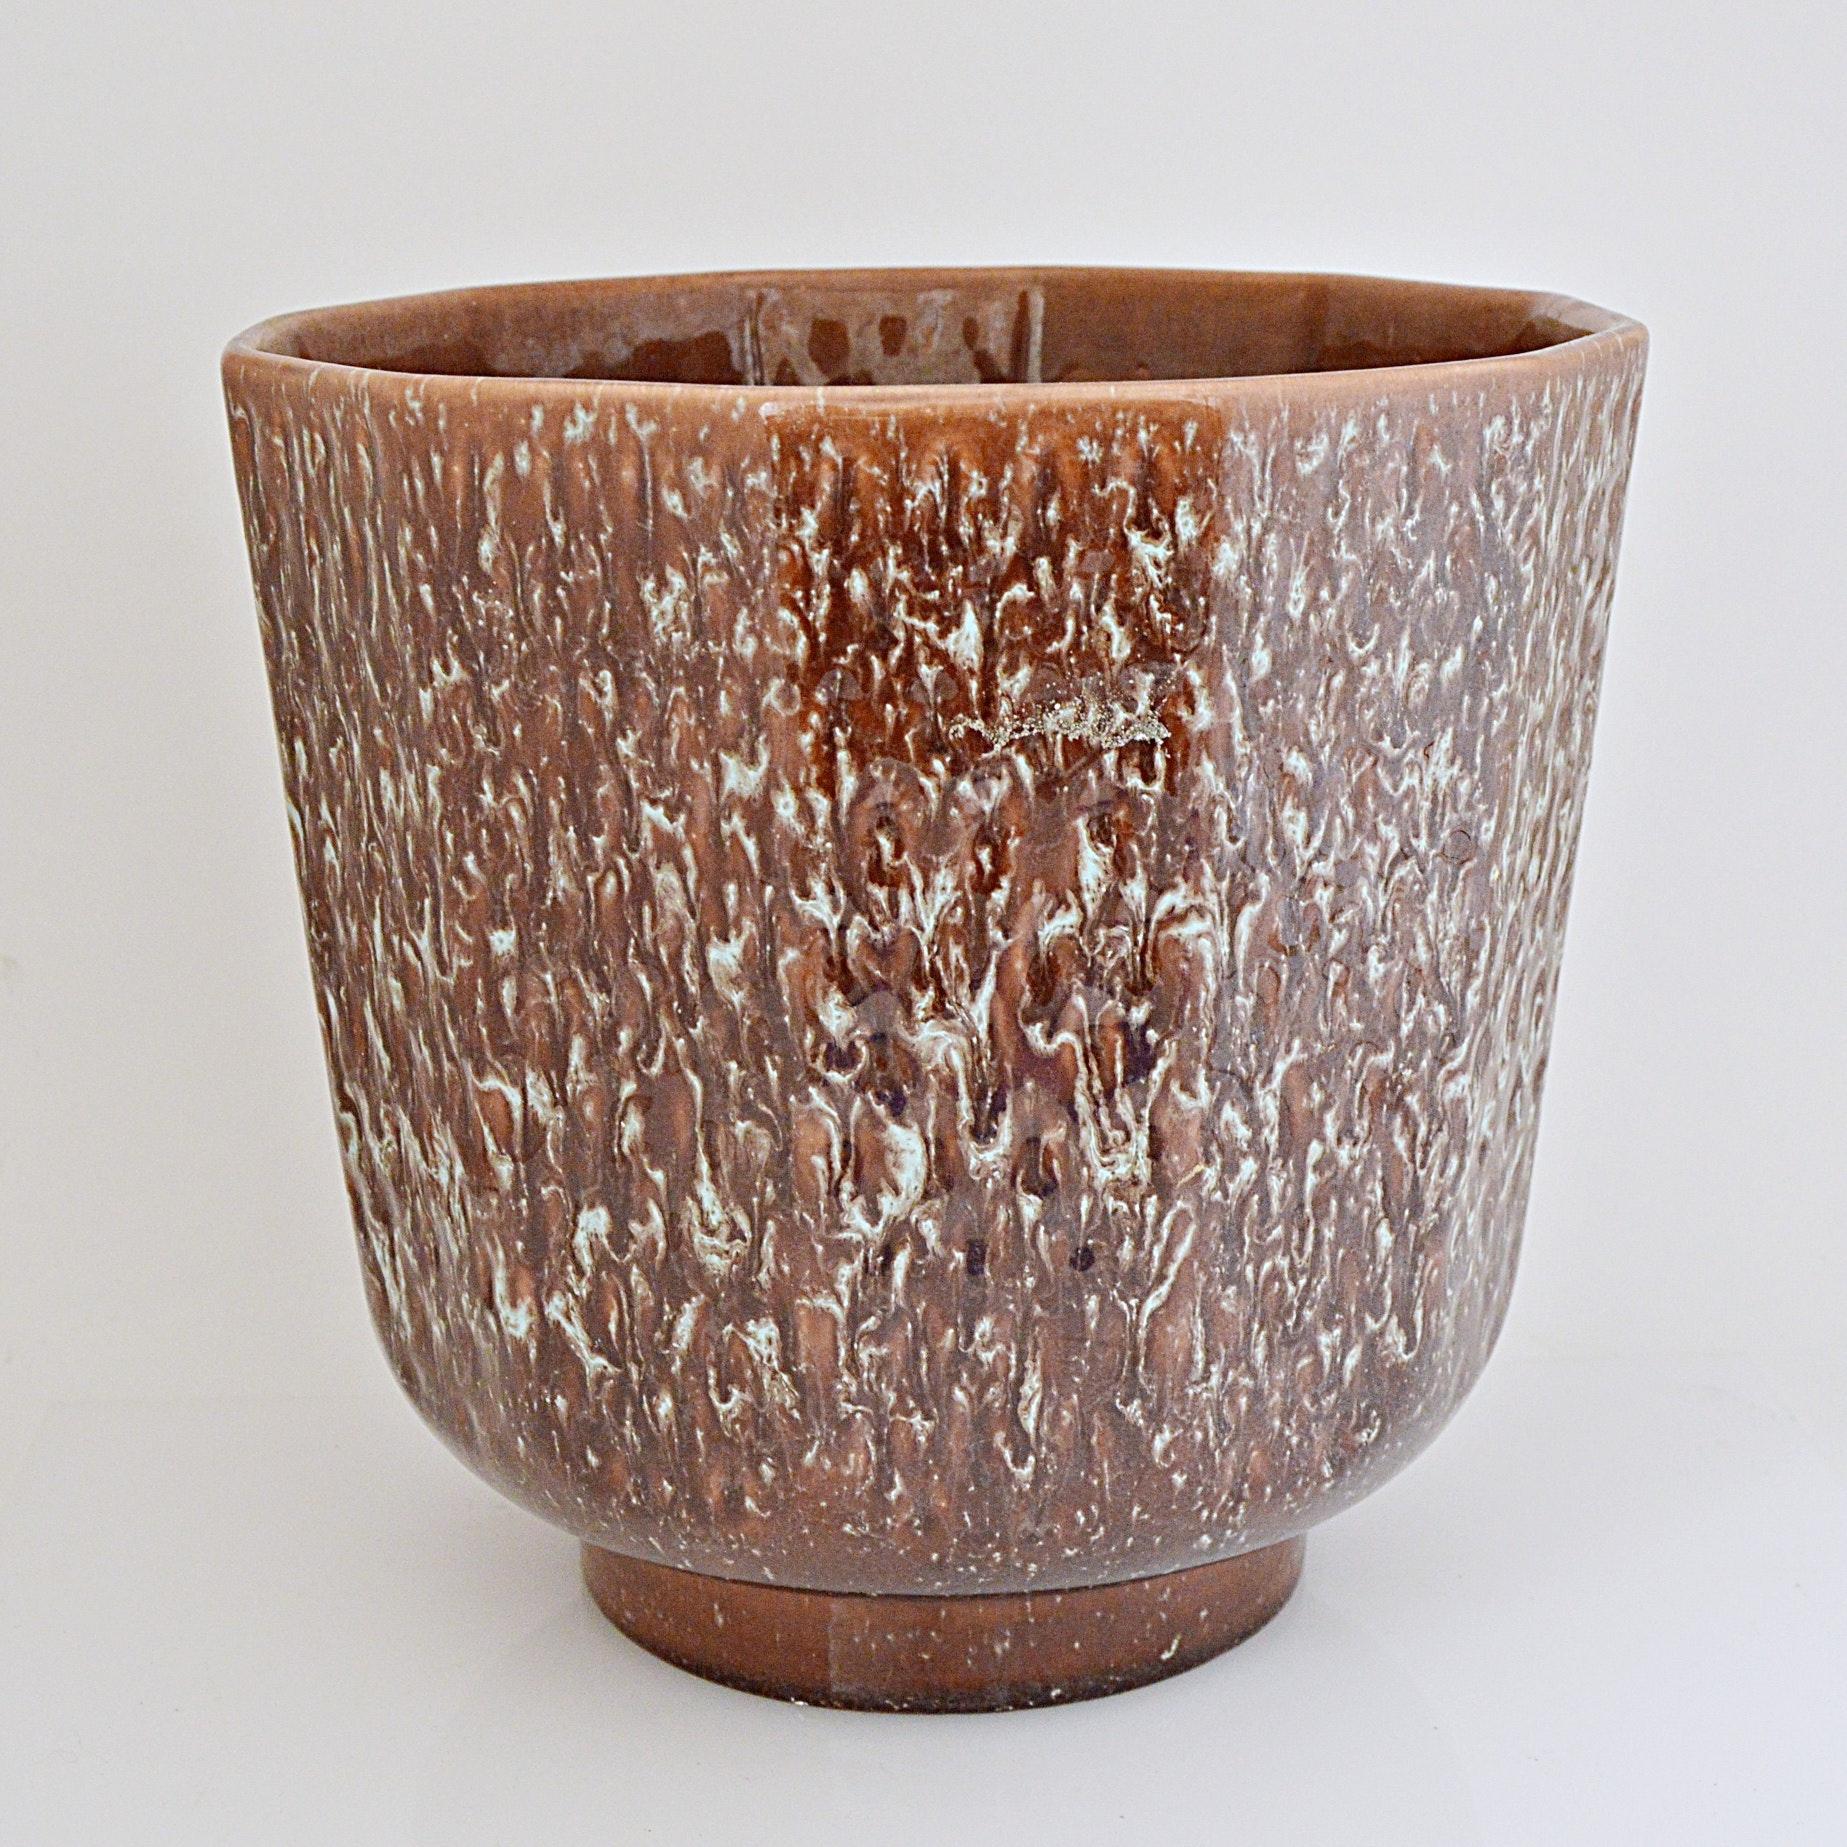 Vintage Haeger Pottery Planter